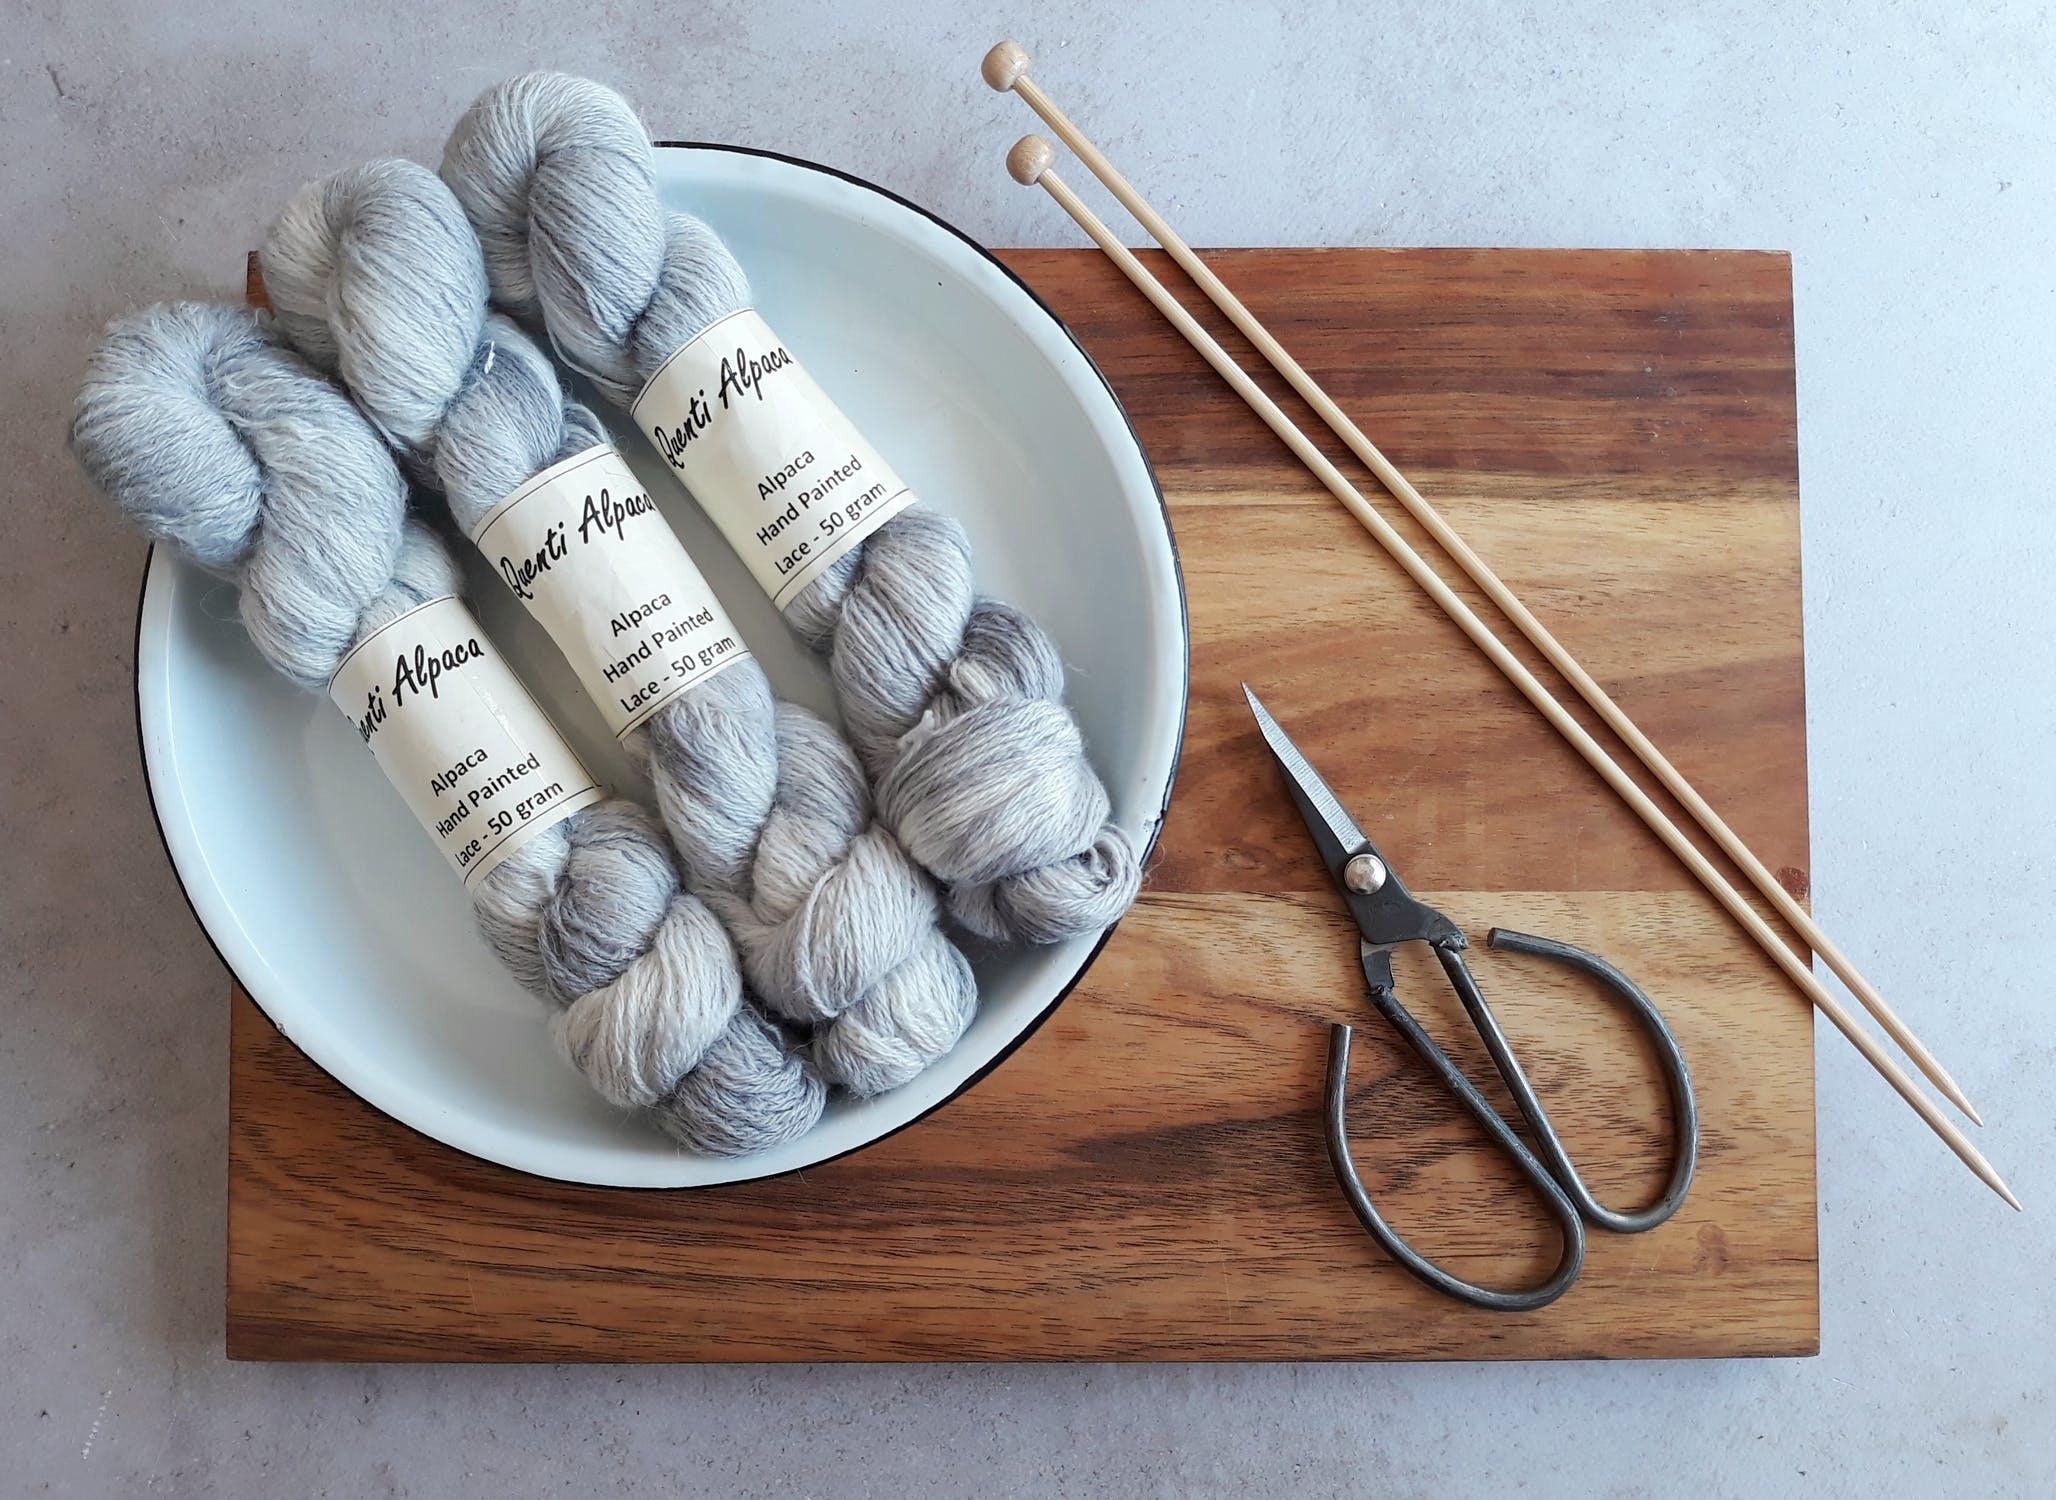 knitting yarn, needles and scissors